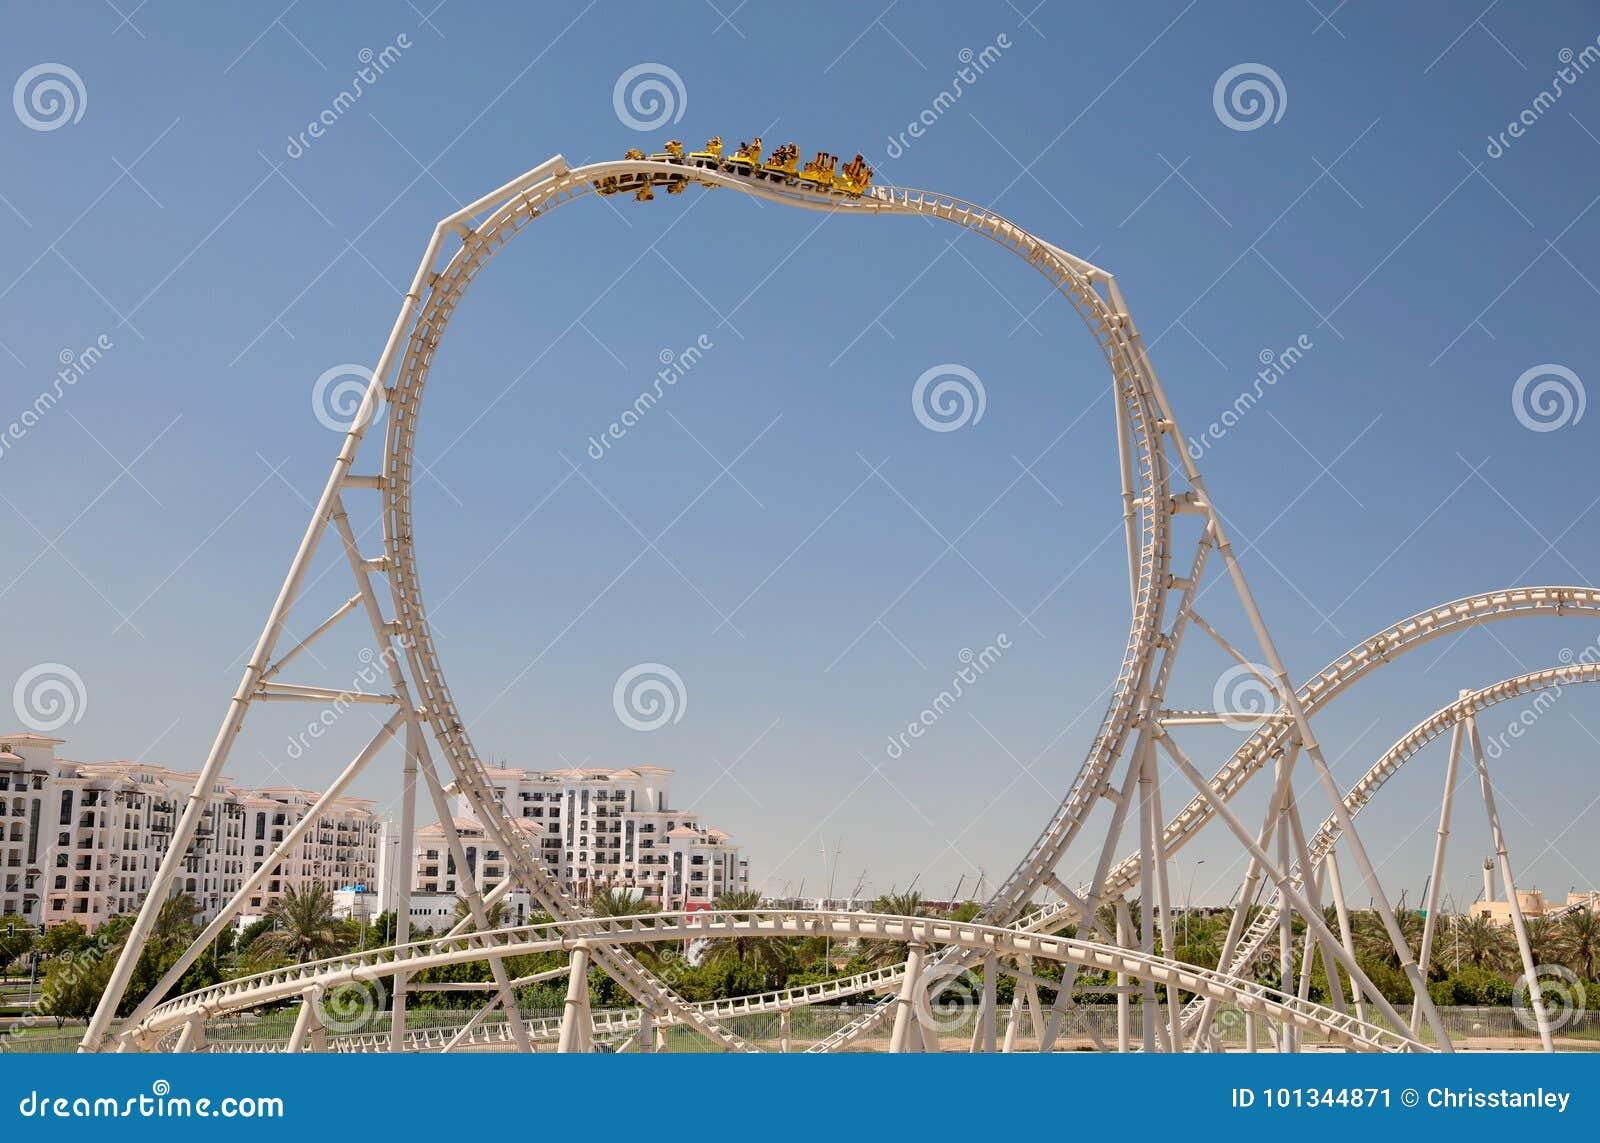 Ferrari World Roller Coaster Editorial Photo Image Of Entertainment Coaster 101344871